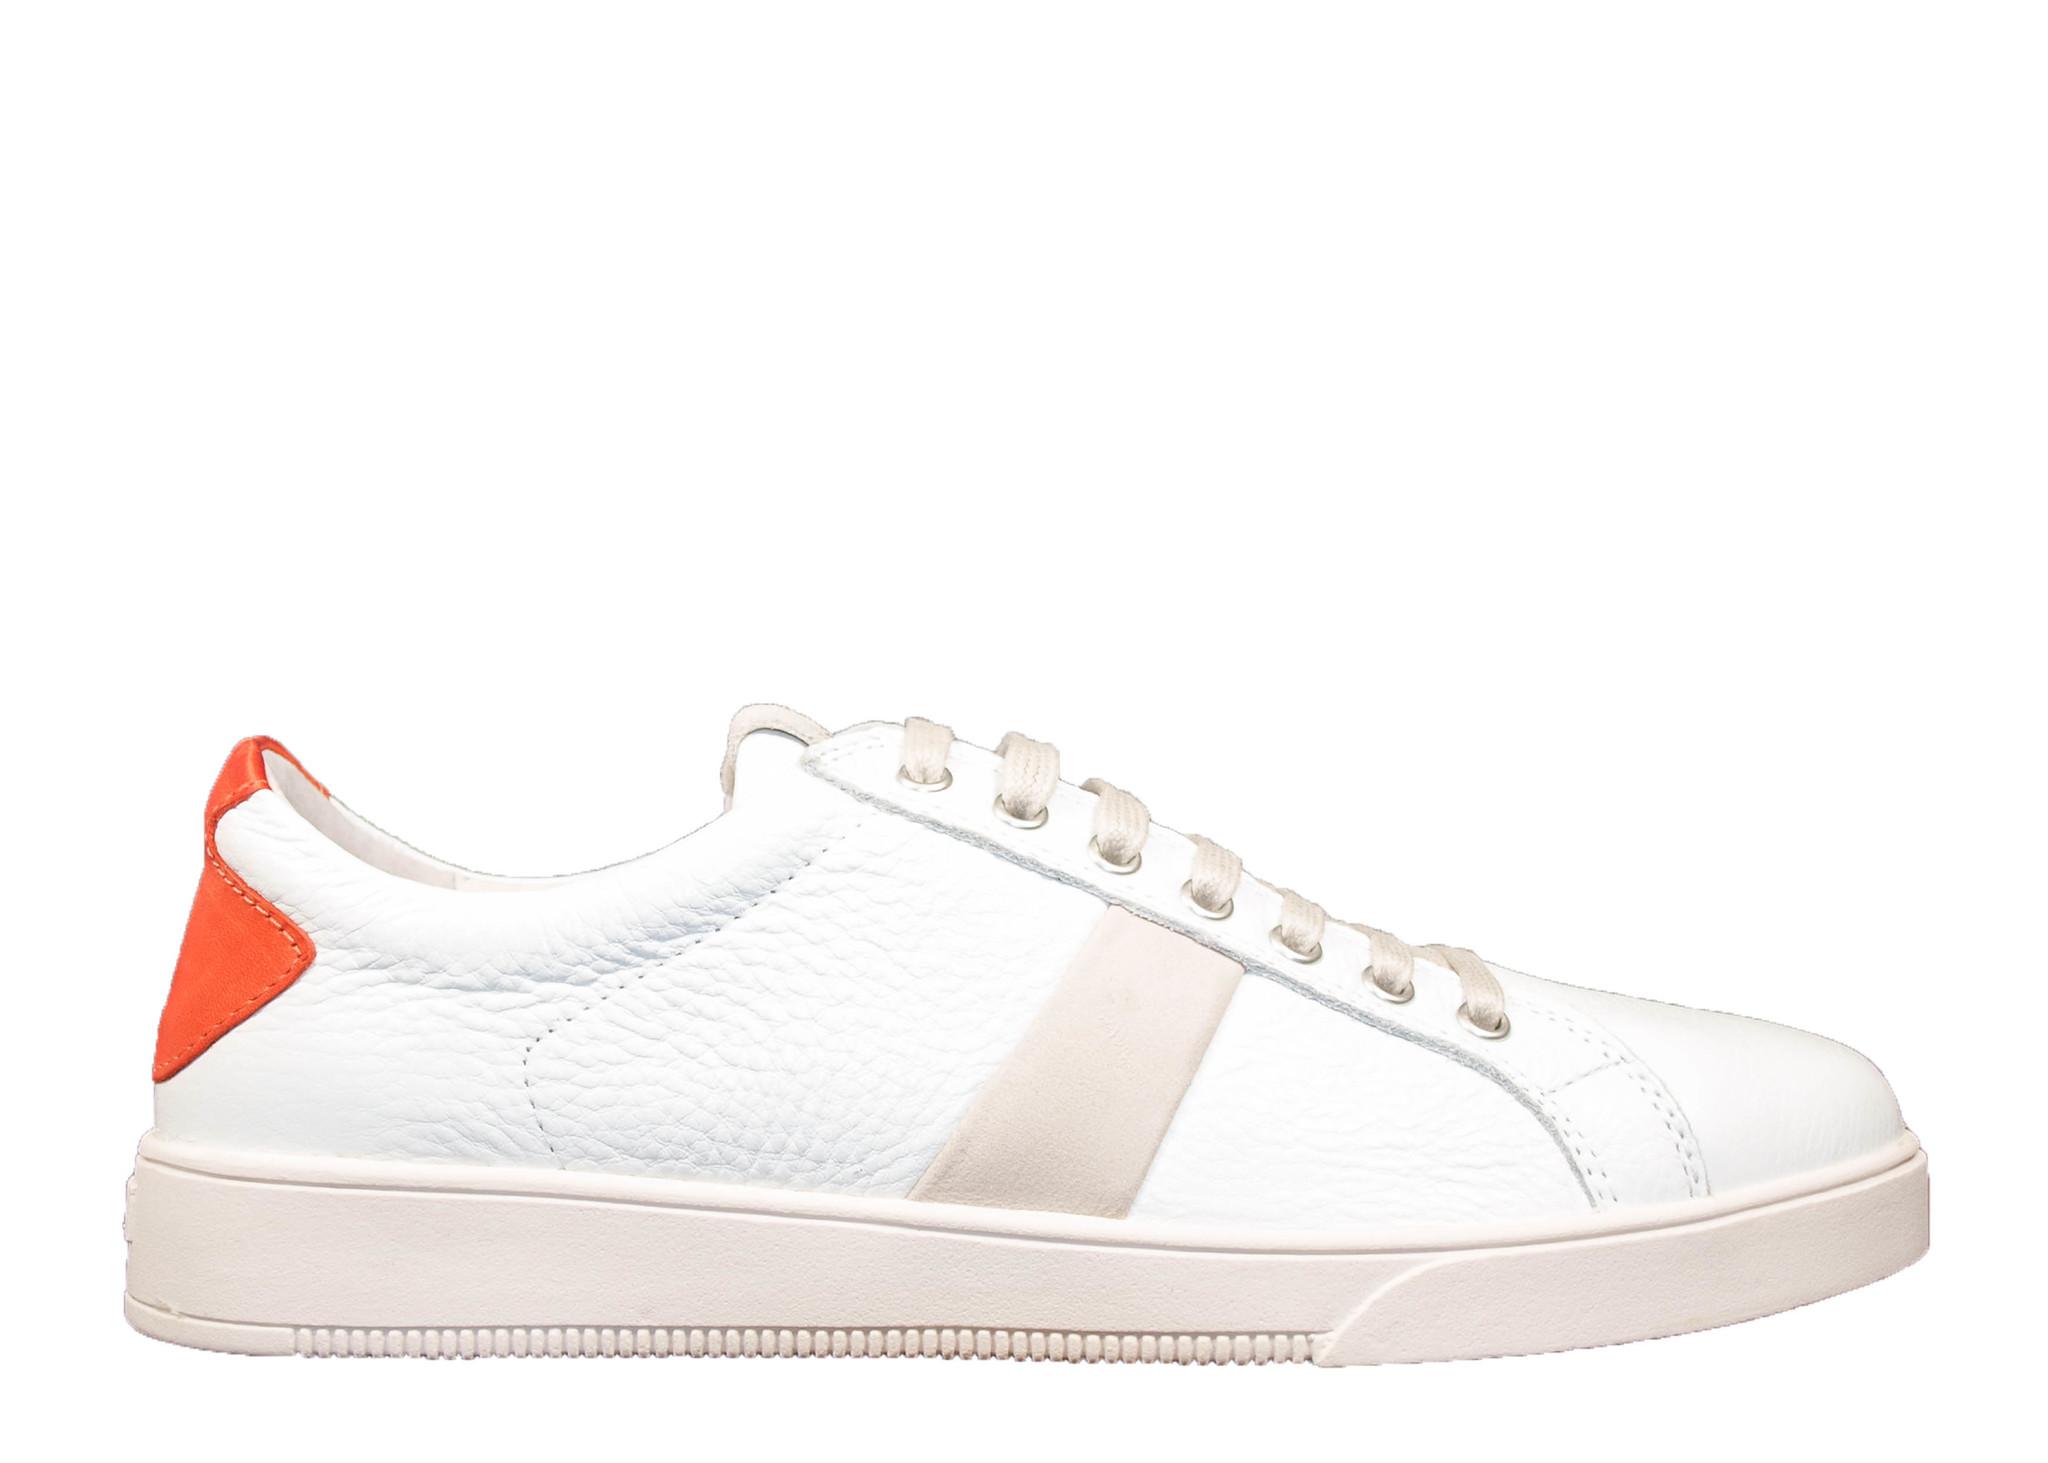 blackstone heren Blackstone Sneaker VG20 Puffins Wit/ Oranje